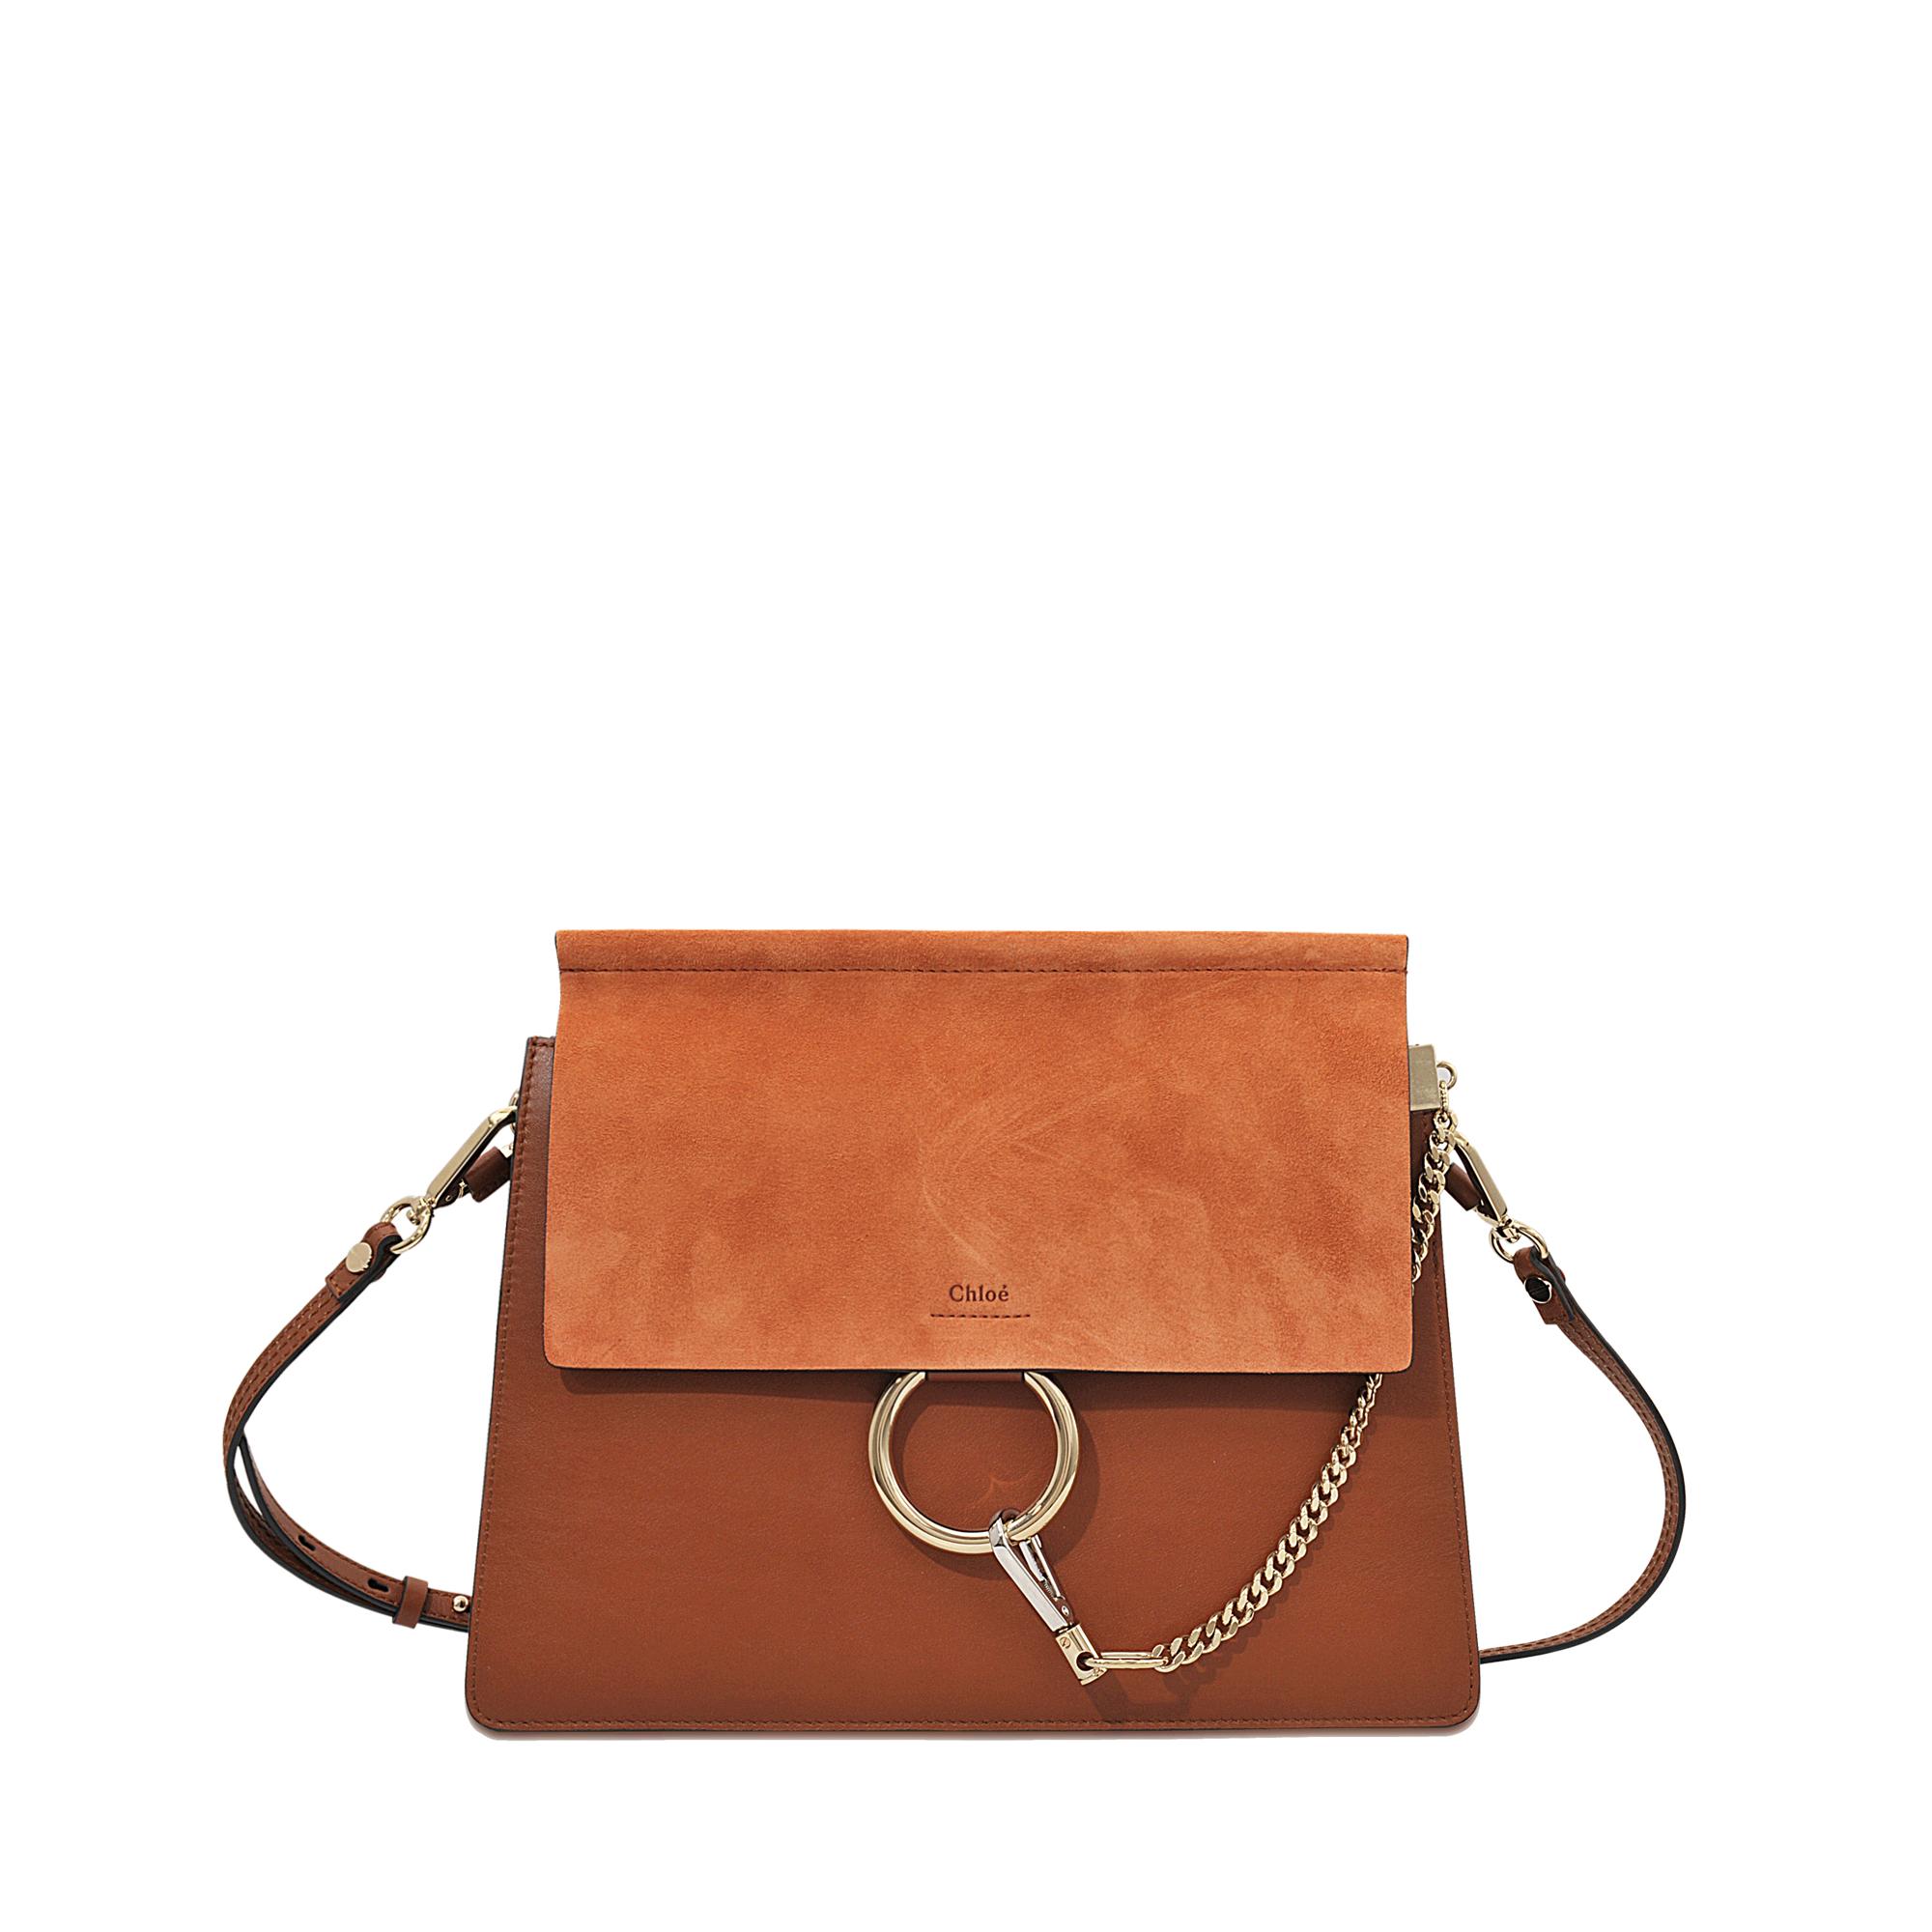 8325e5bf45 Chloé Faye Medium Shoulder Bag in Orange - Lyst